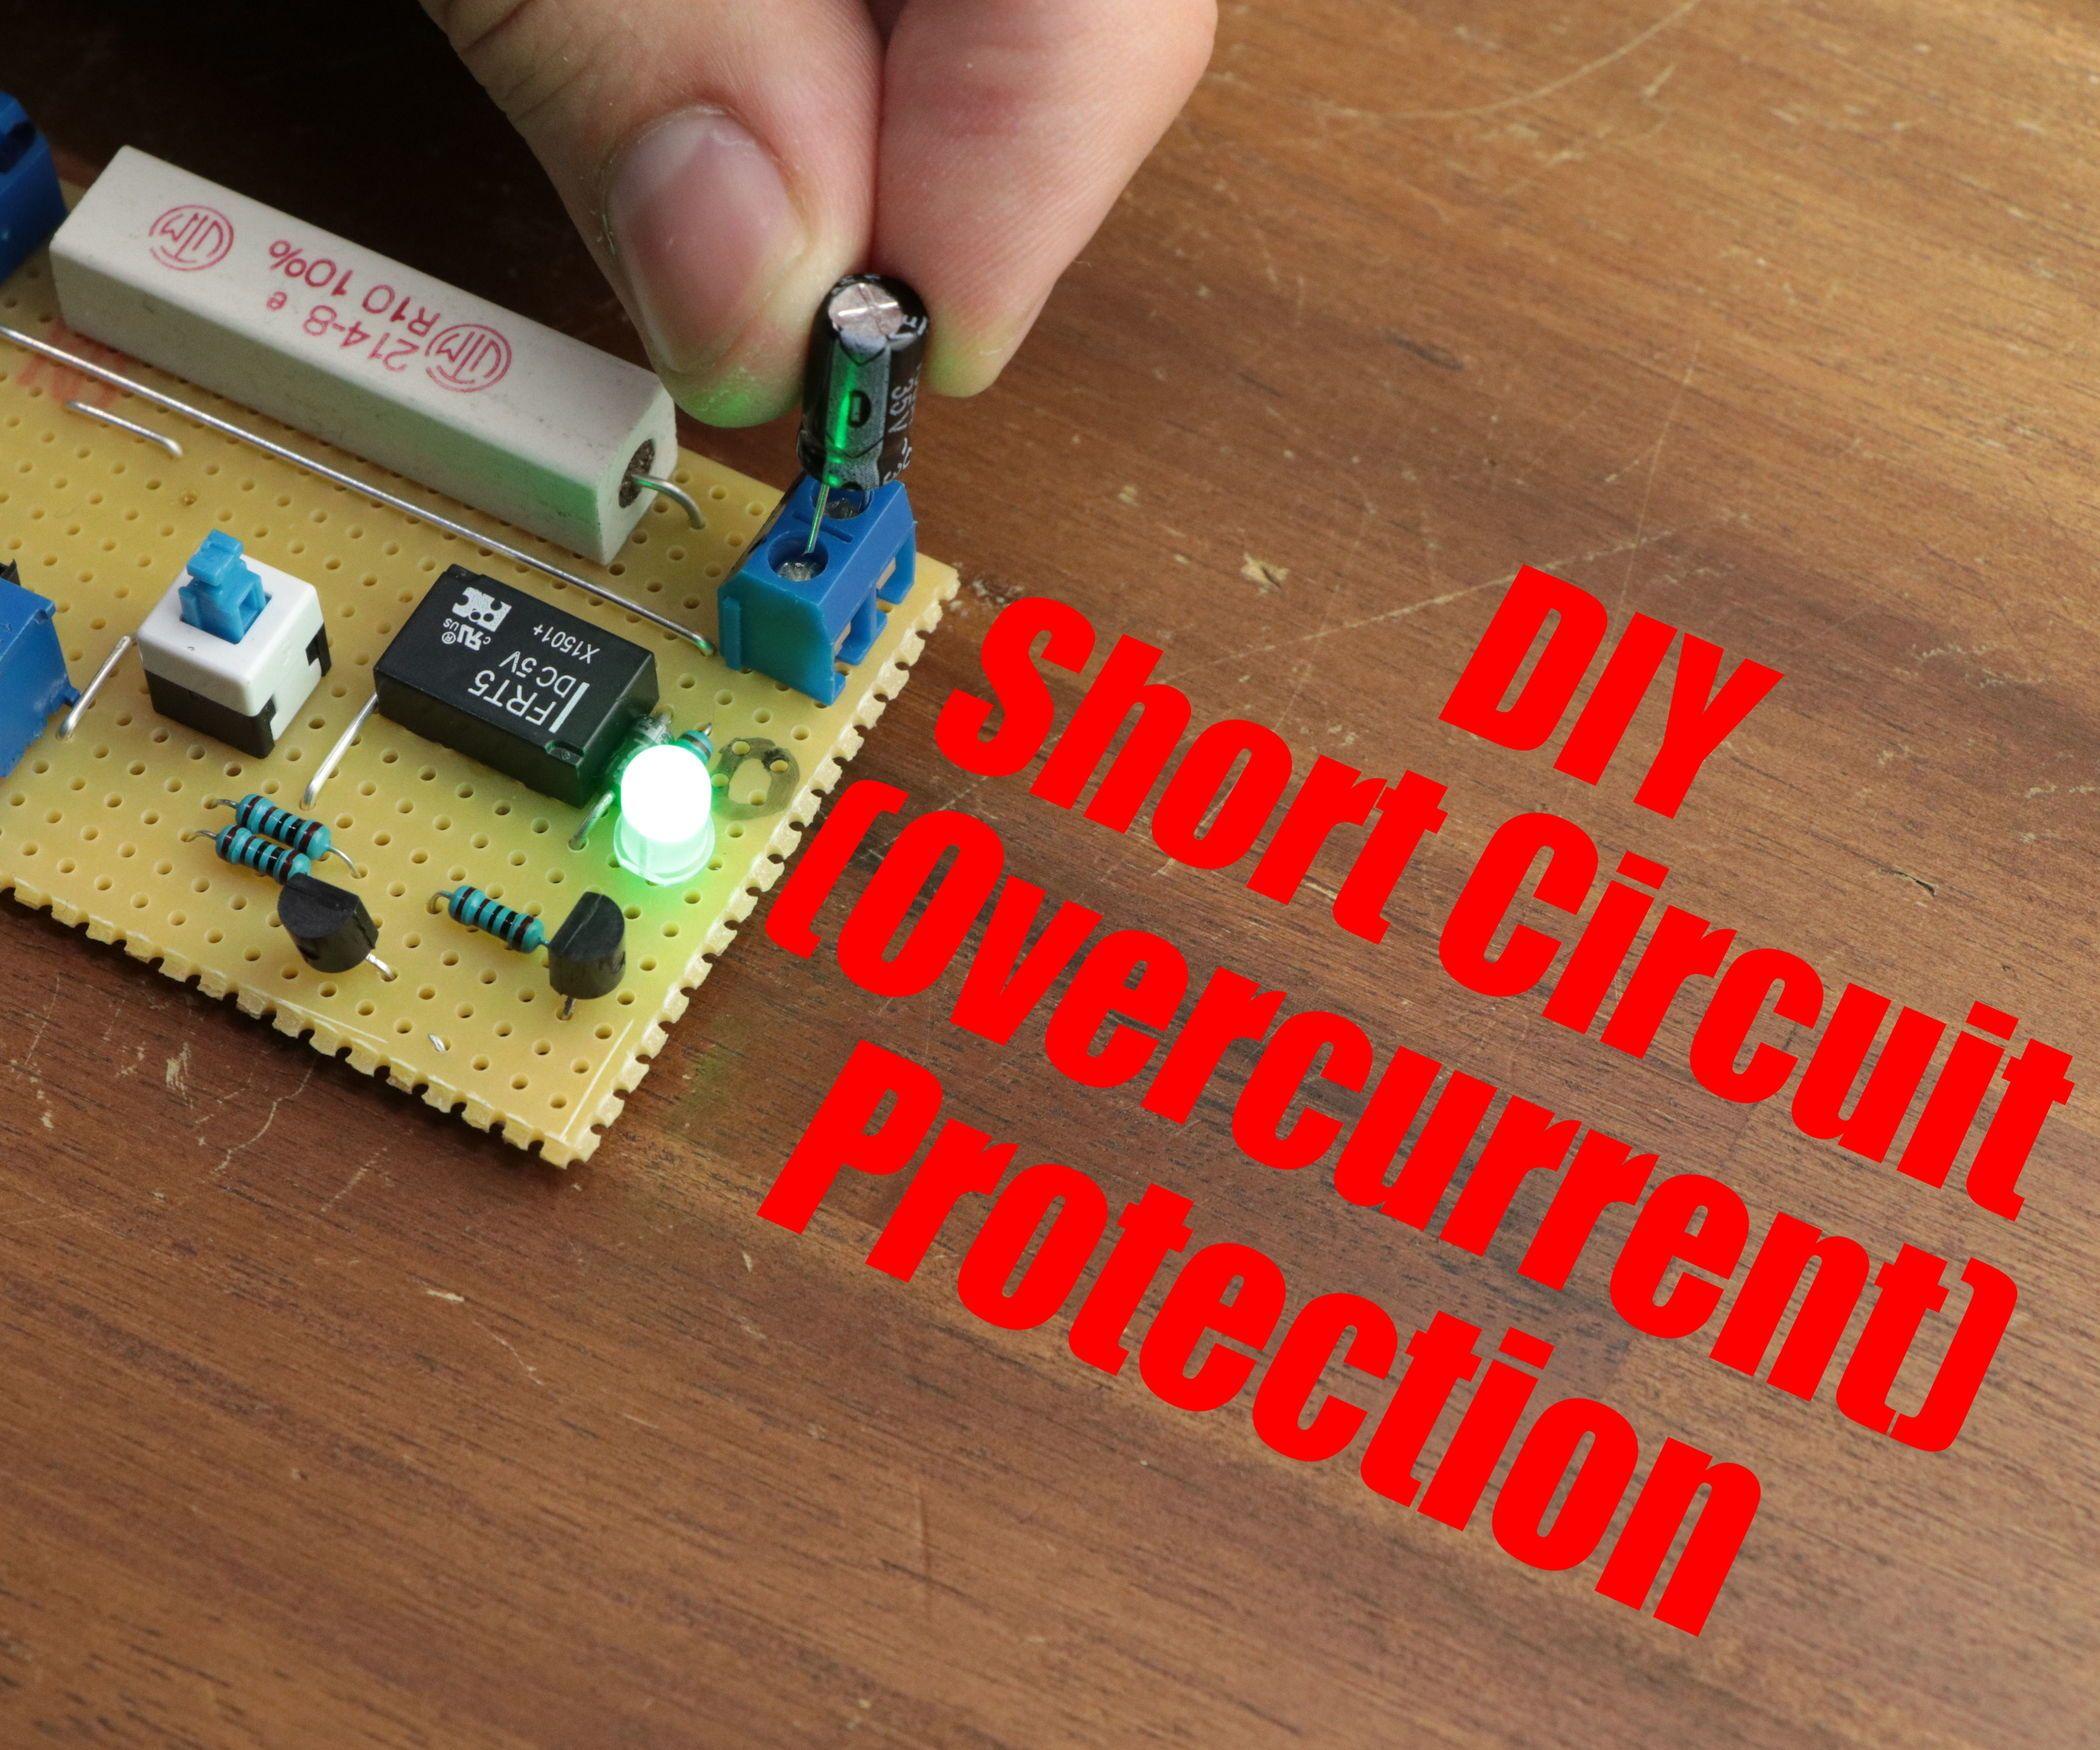 DIY Short Circuit (Overcurrent) Protection | Circuits, Diy ...